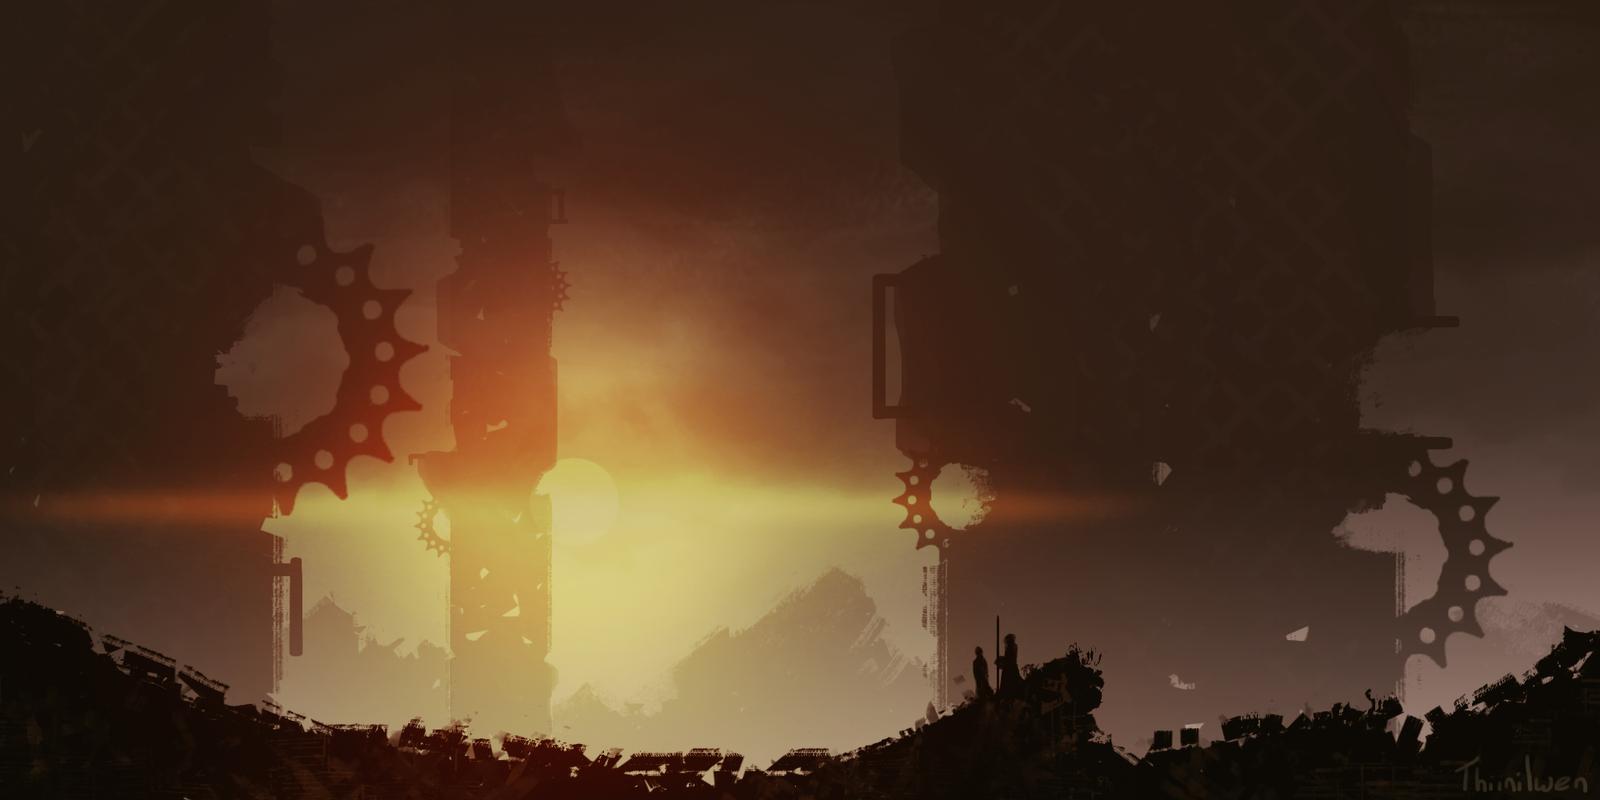 Industrial by Kathryb